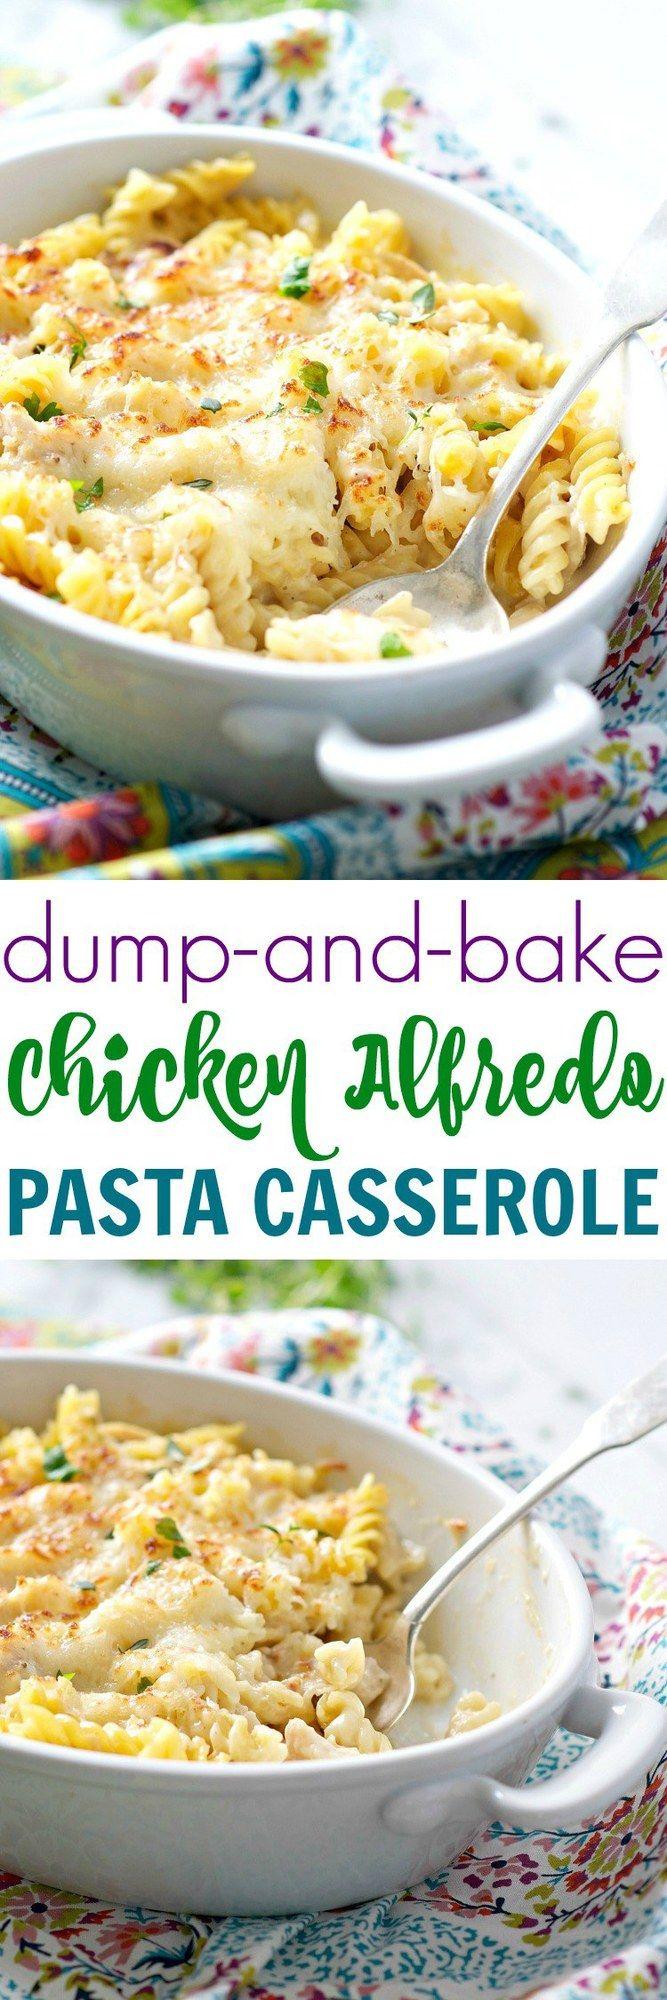 Dump and Bake Chicken Alfredo Pasta Casserole #chickenalfredo